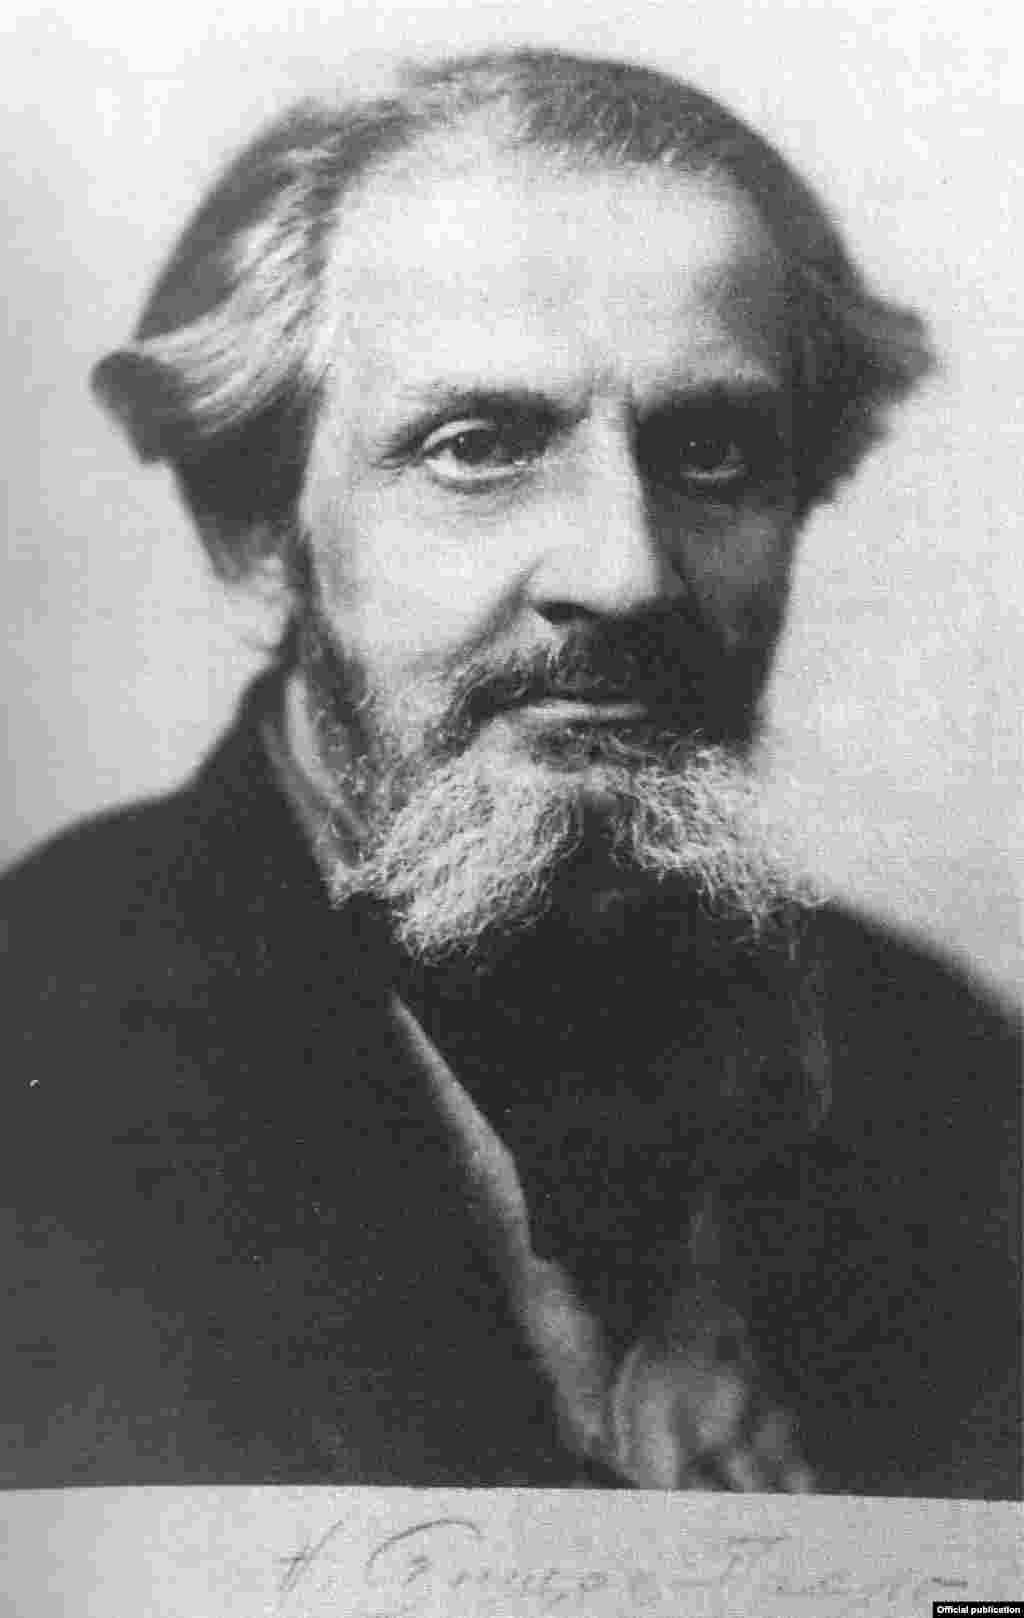 Fotografie a lui Iakov Kagan-Șabșai, cca 1930.